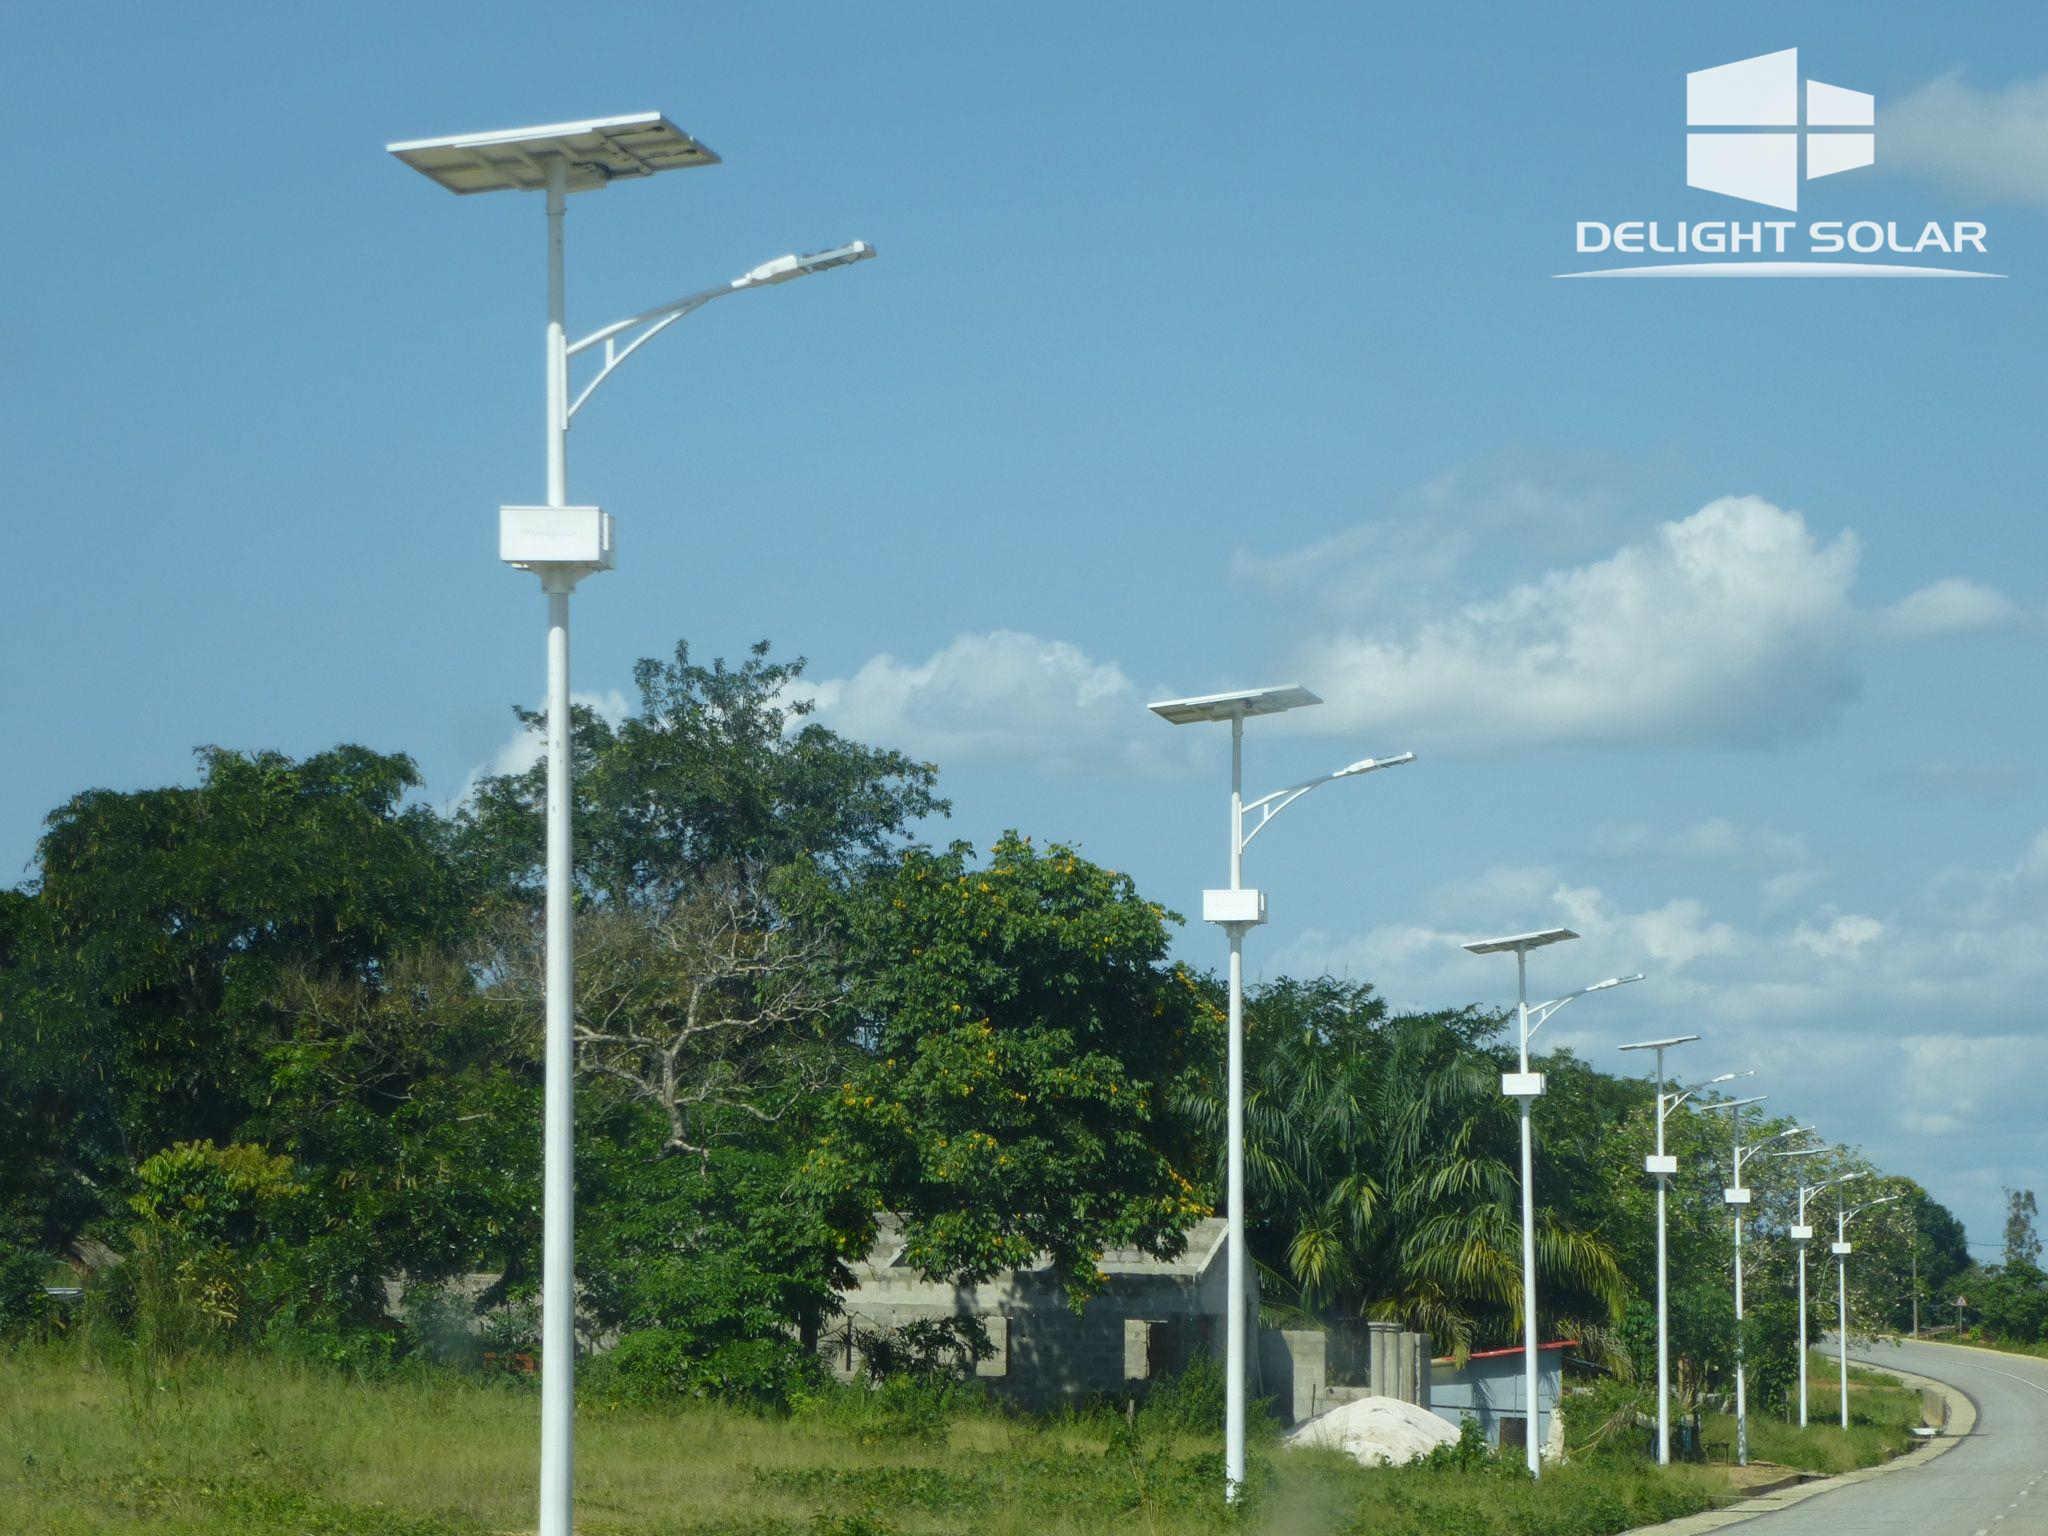 8M 60W SOLAR STREET LIGHT - CONGO, JULY, 2014